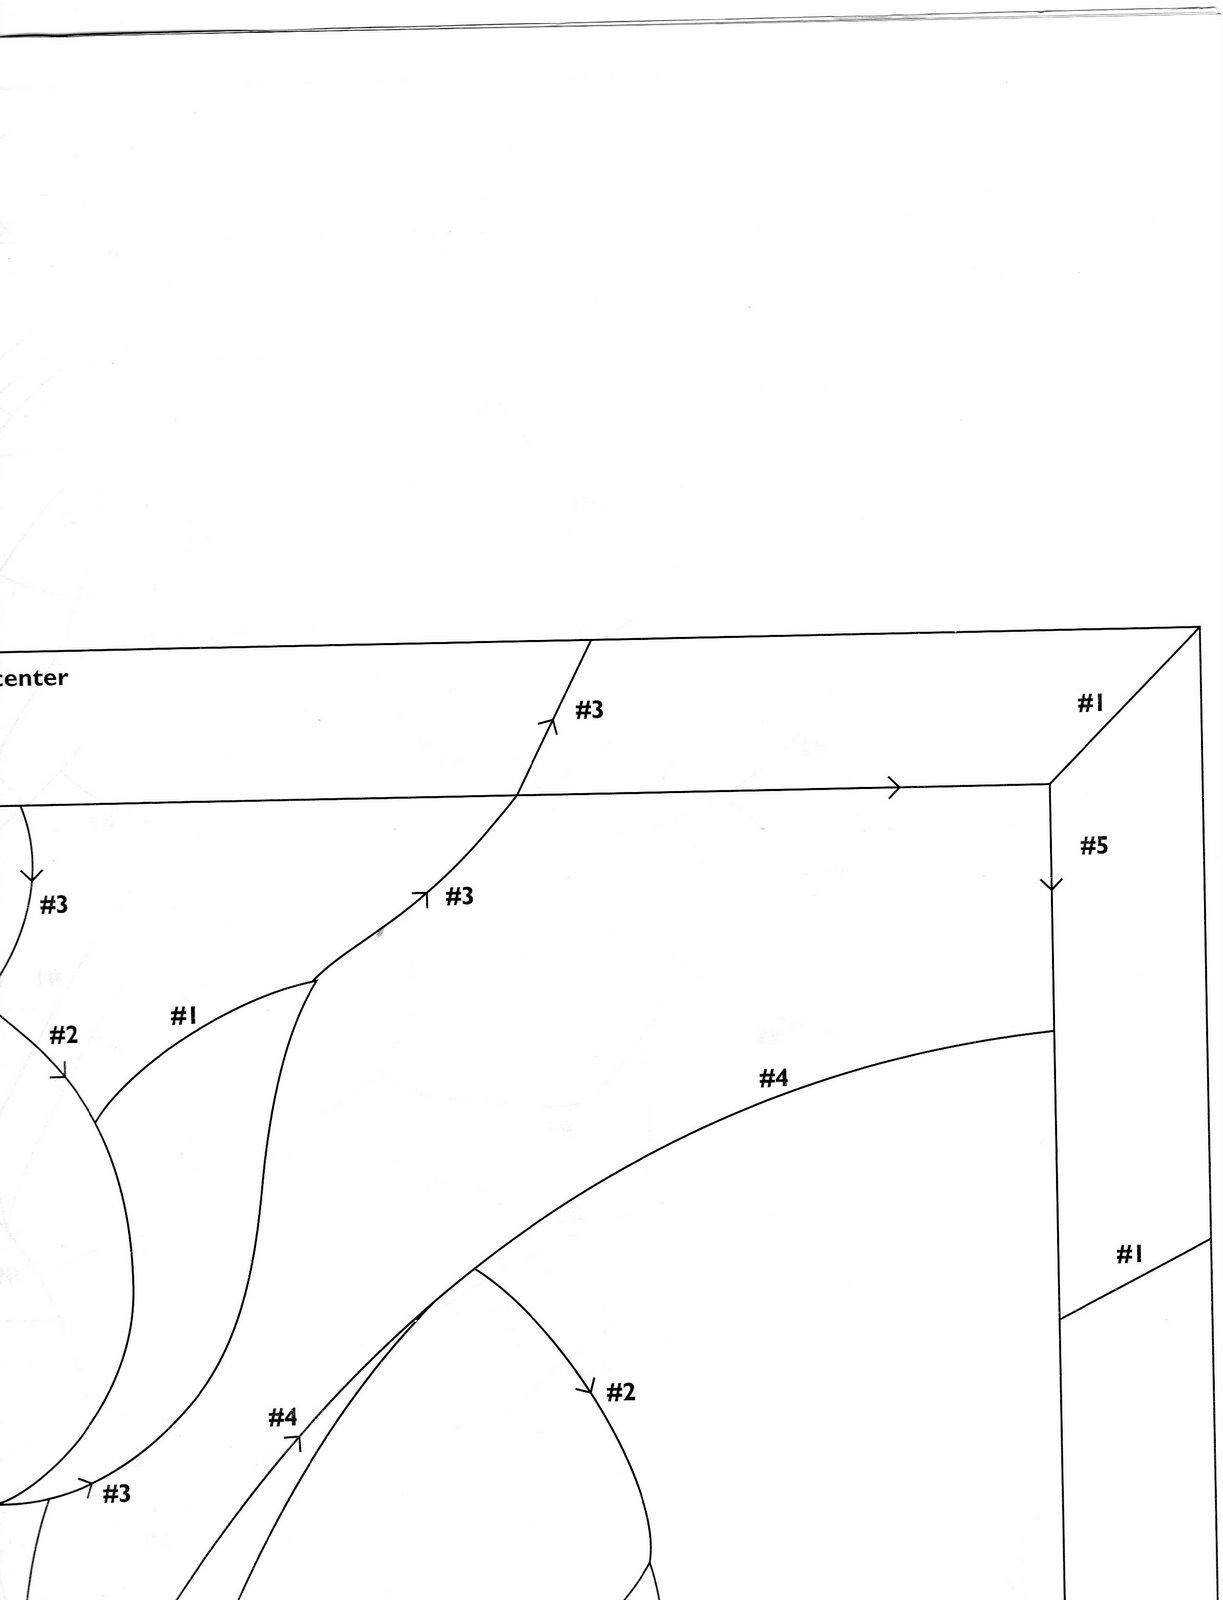 image H o y o ray for b o y o bies 7